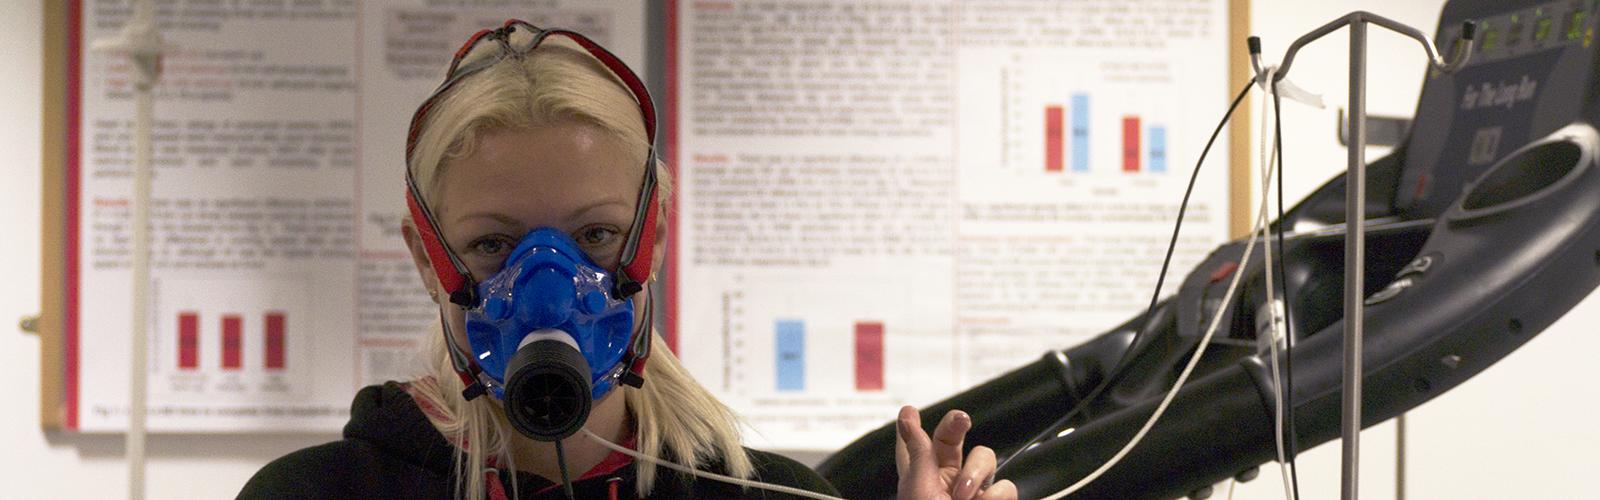 Rebecca Murray wearing an oxygen mask